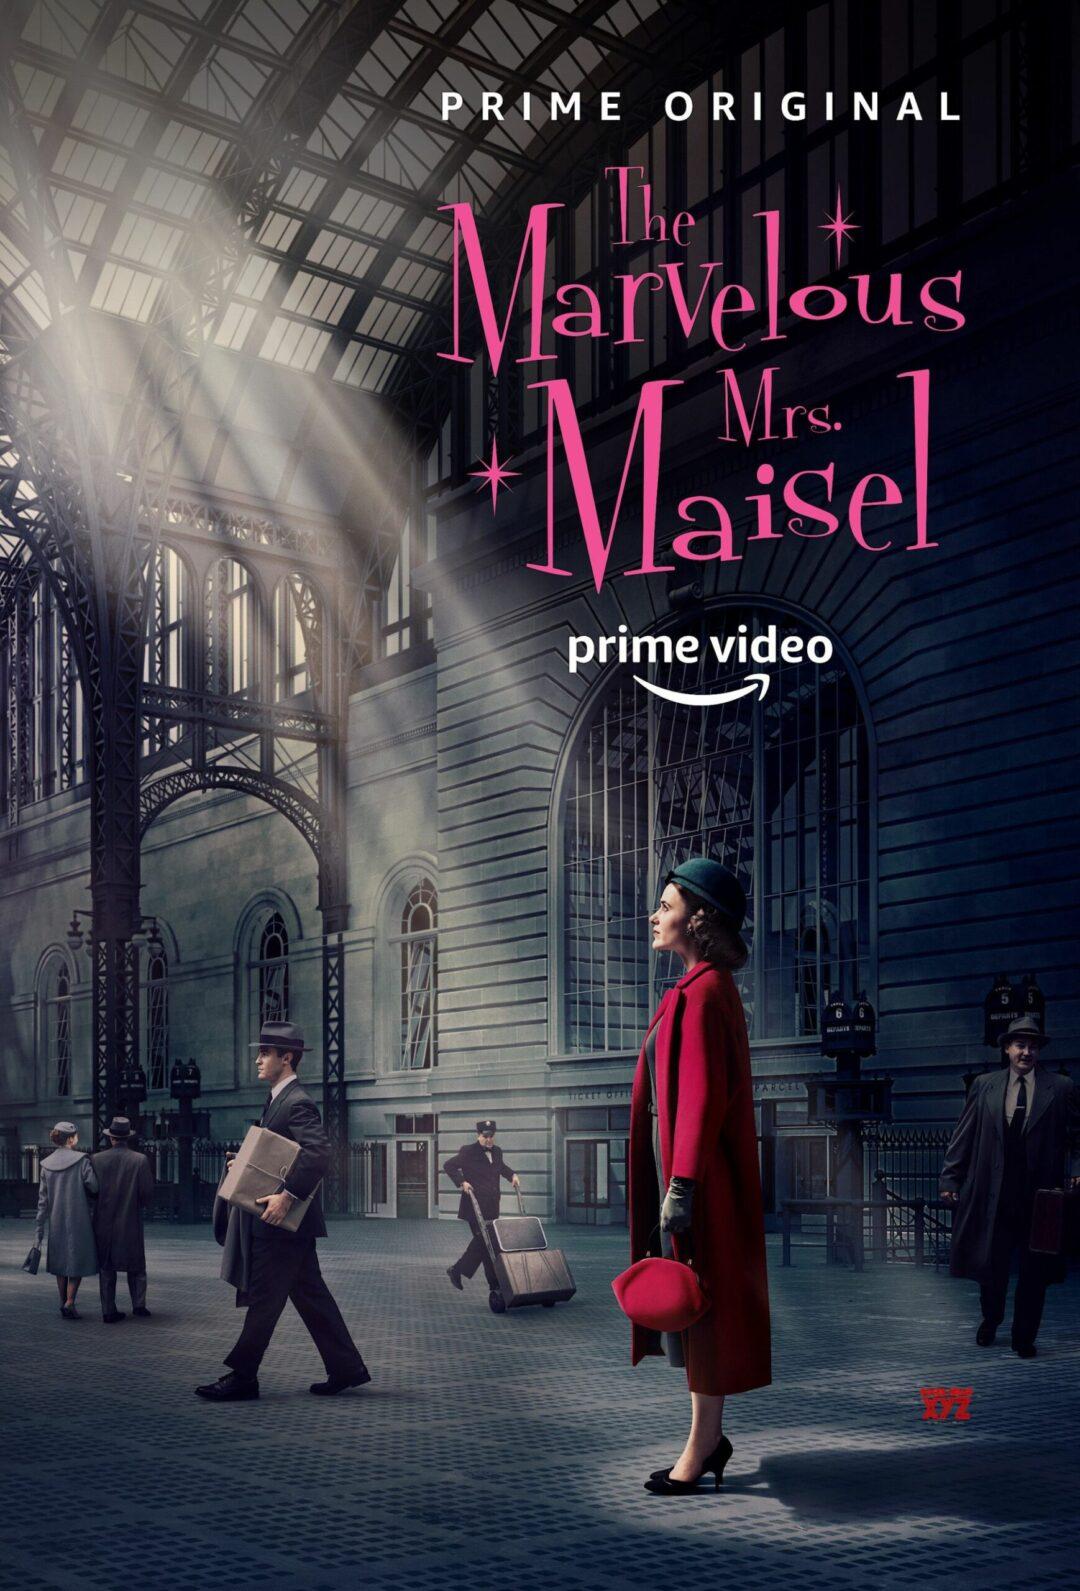 The Marvelous Mrs. Maisel prime web series